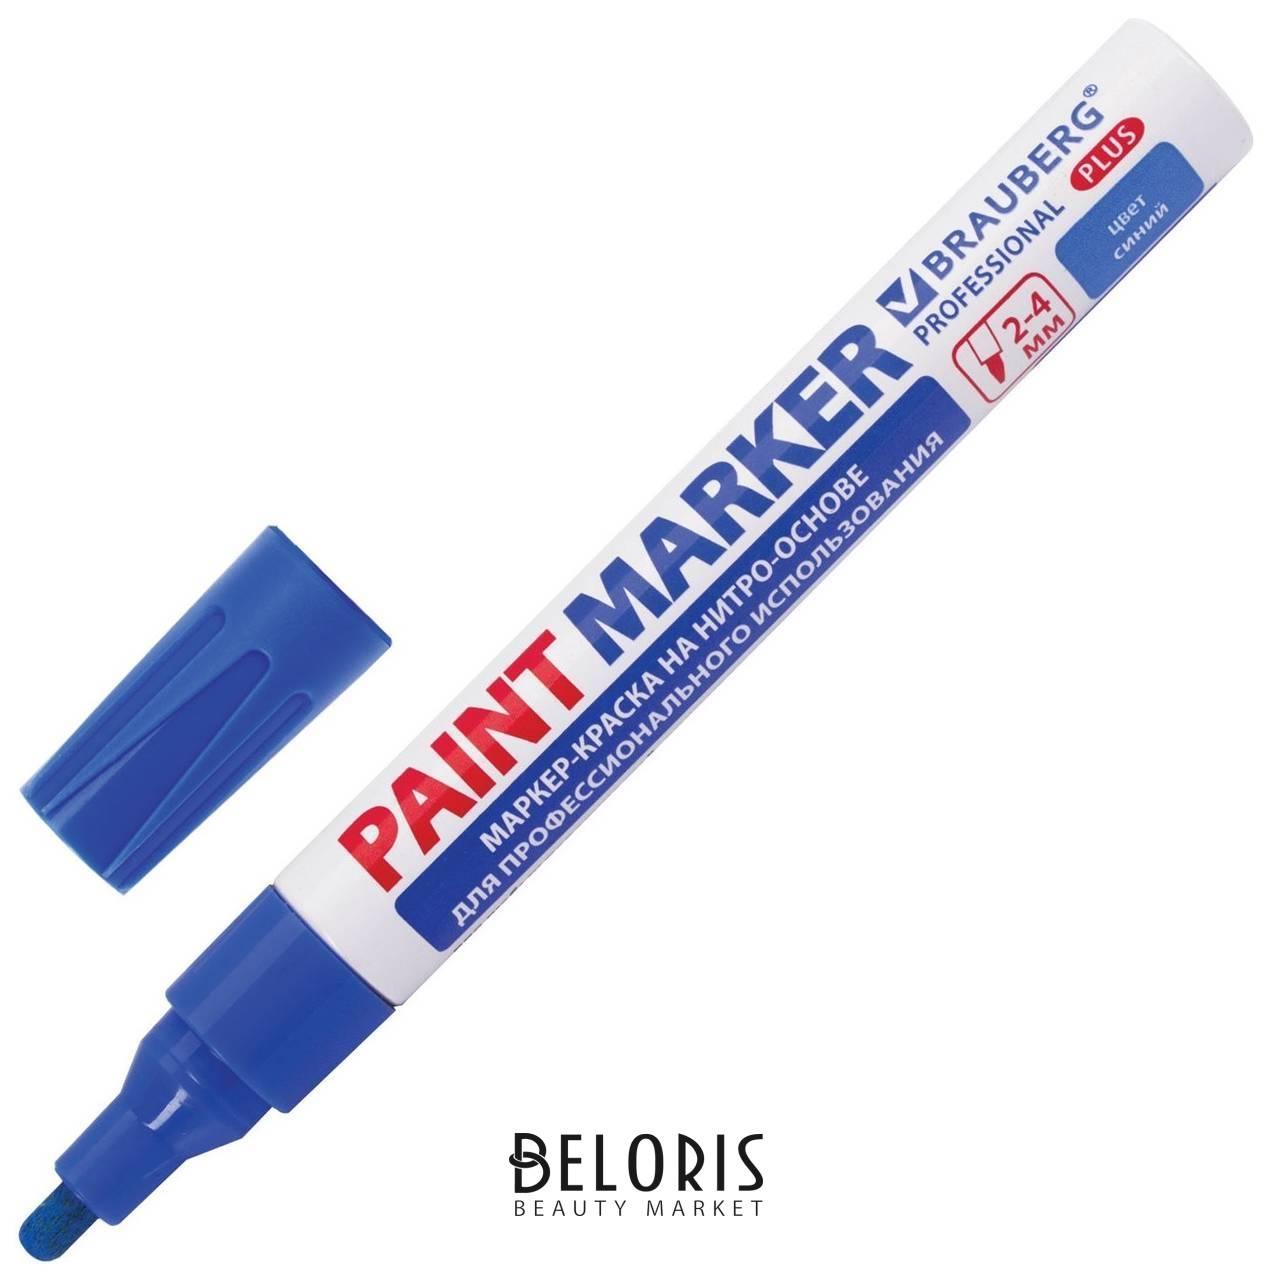 Маркер-краска лаковый (Paint Marker) 4 мм, синий, нитро-основа, алюминиевый корпус, Brauberg Professional Plus Brauberg